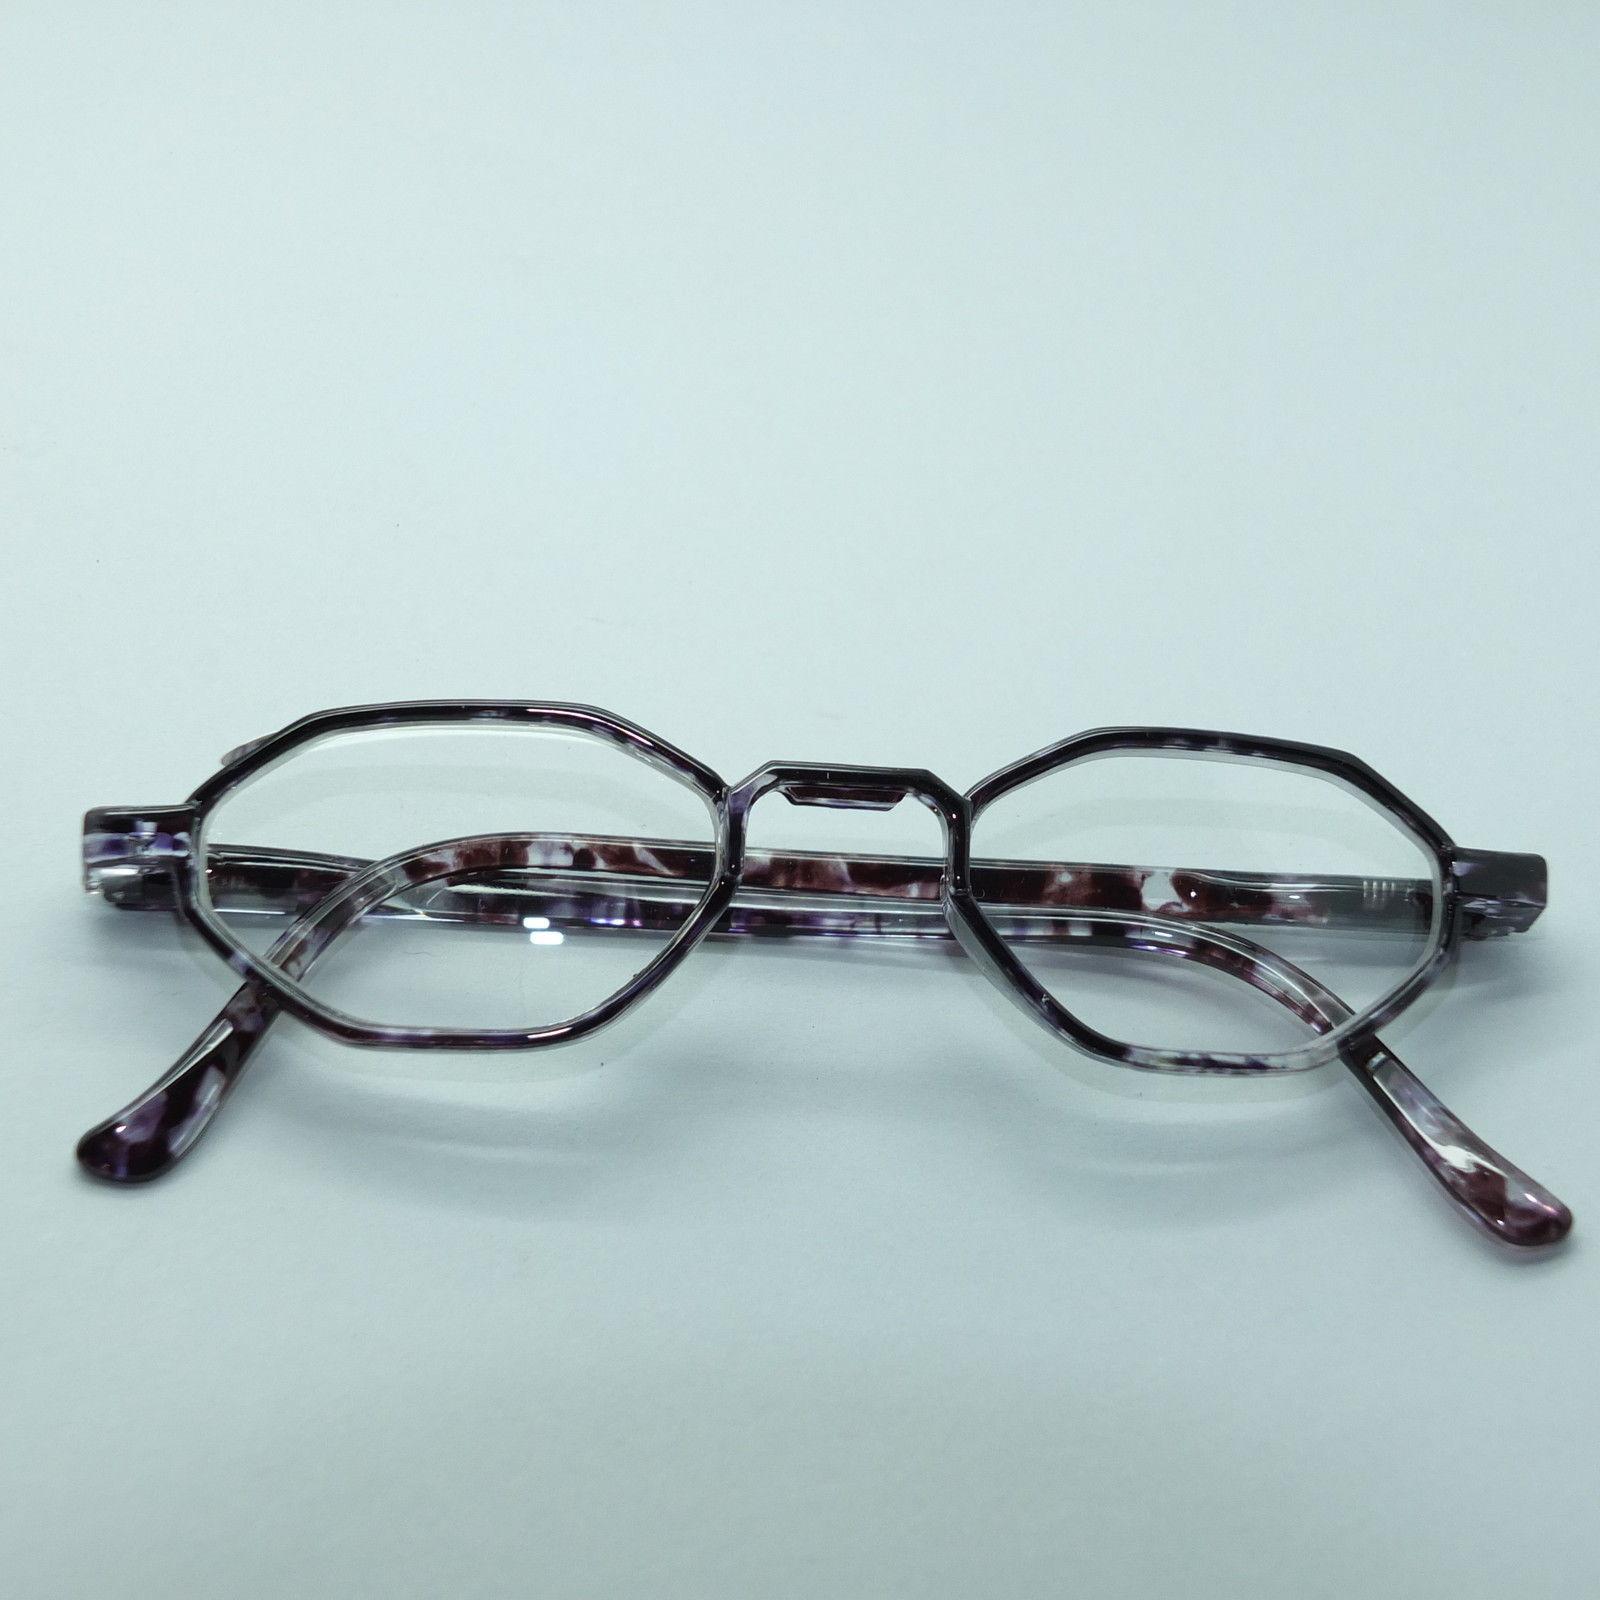 Narrow Frame Reading Glasses : Narrow Hexagon Reading Glasses +1.50 Readers Purple Black ...